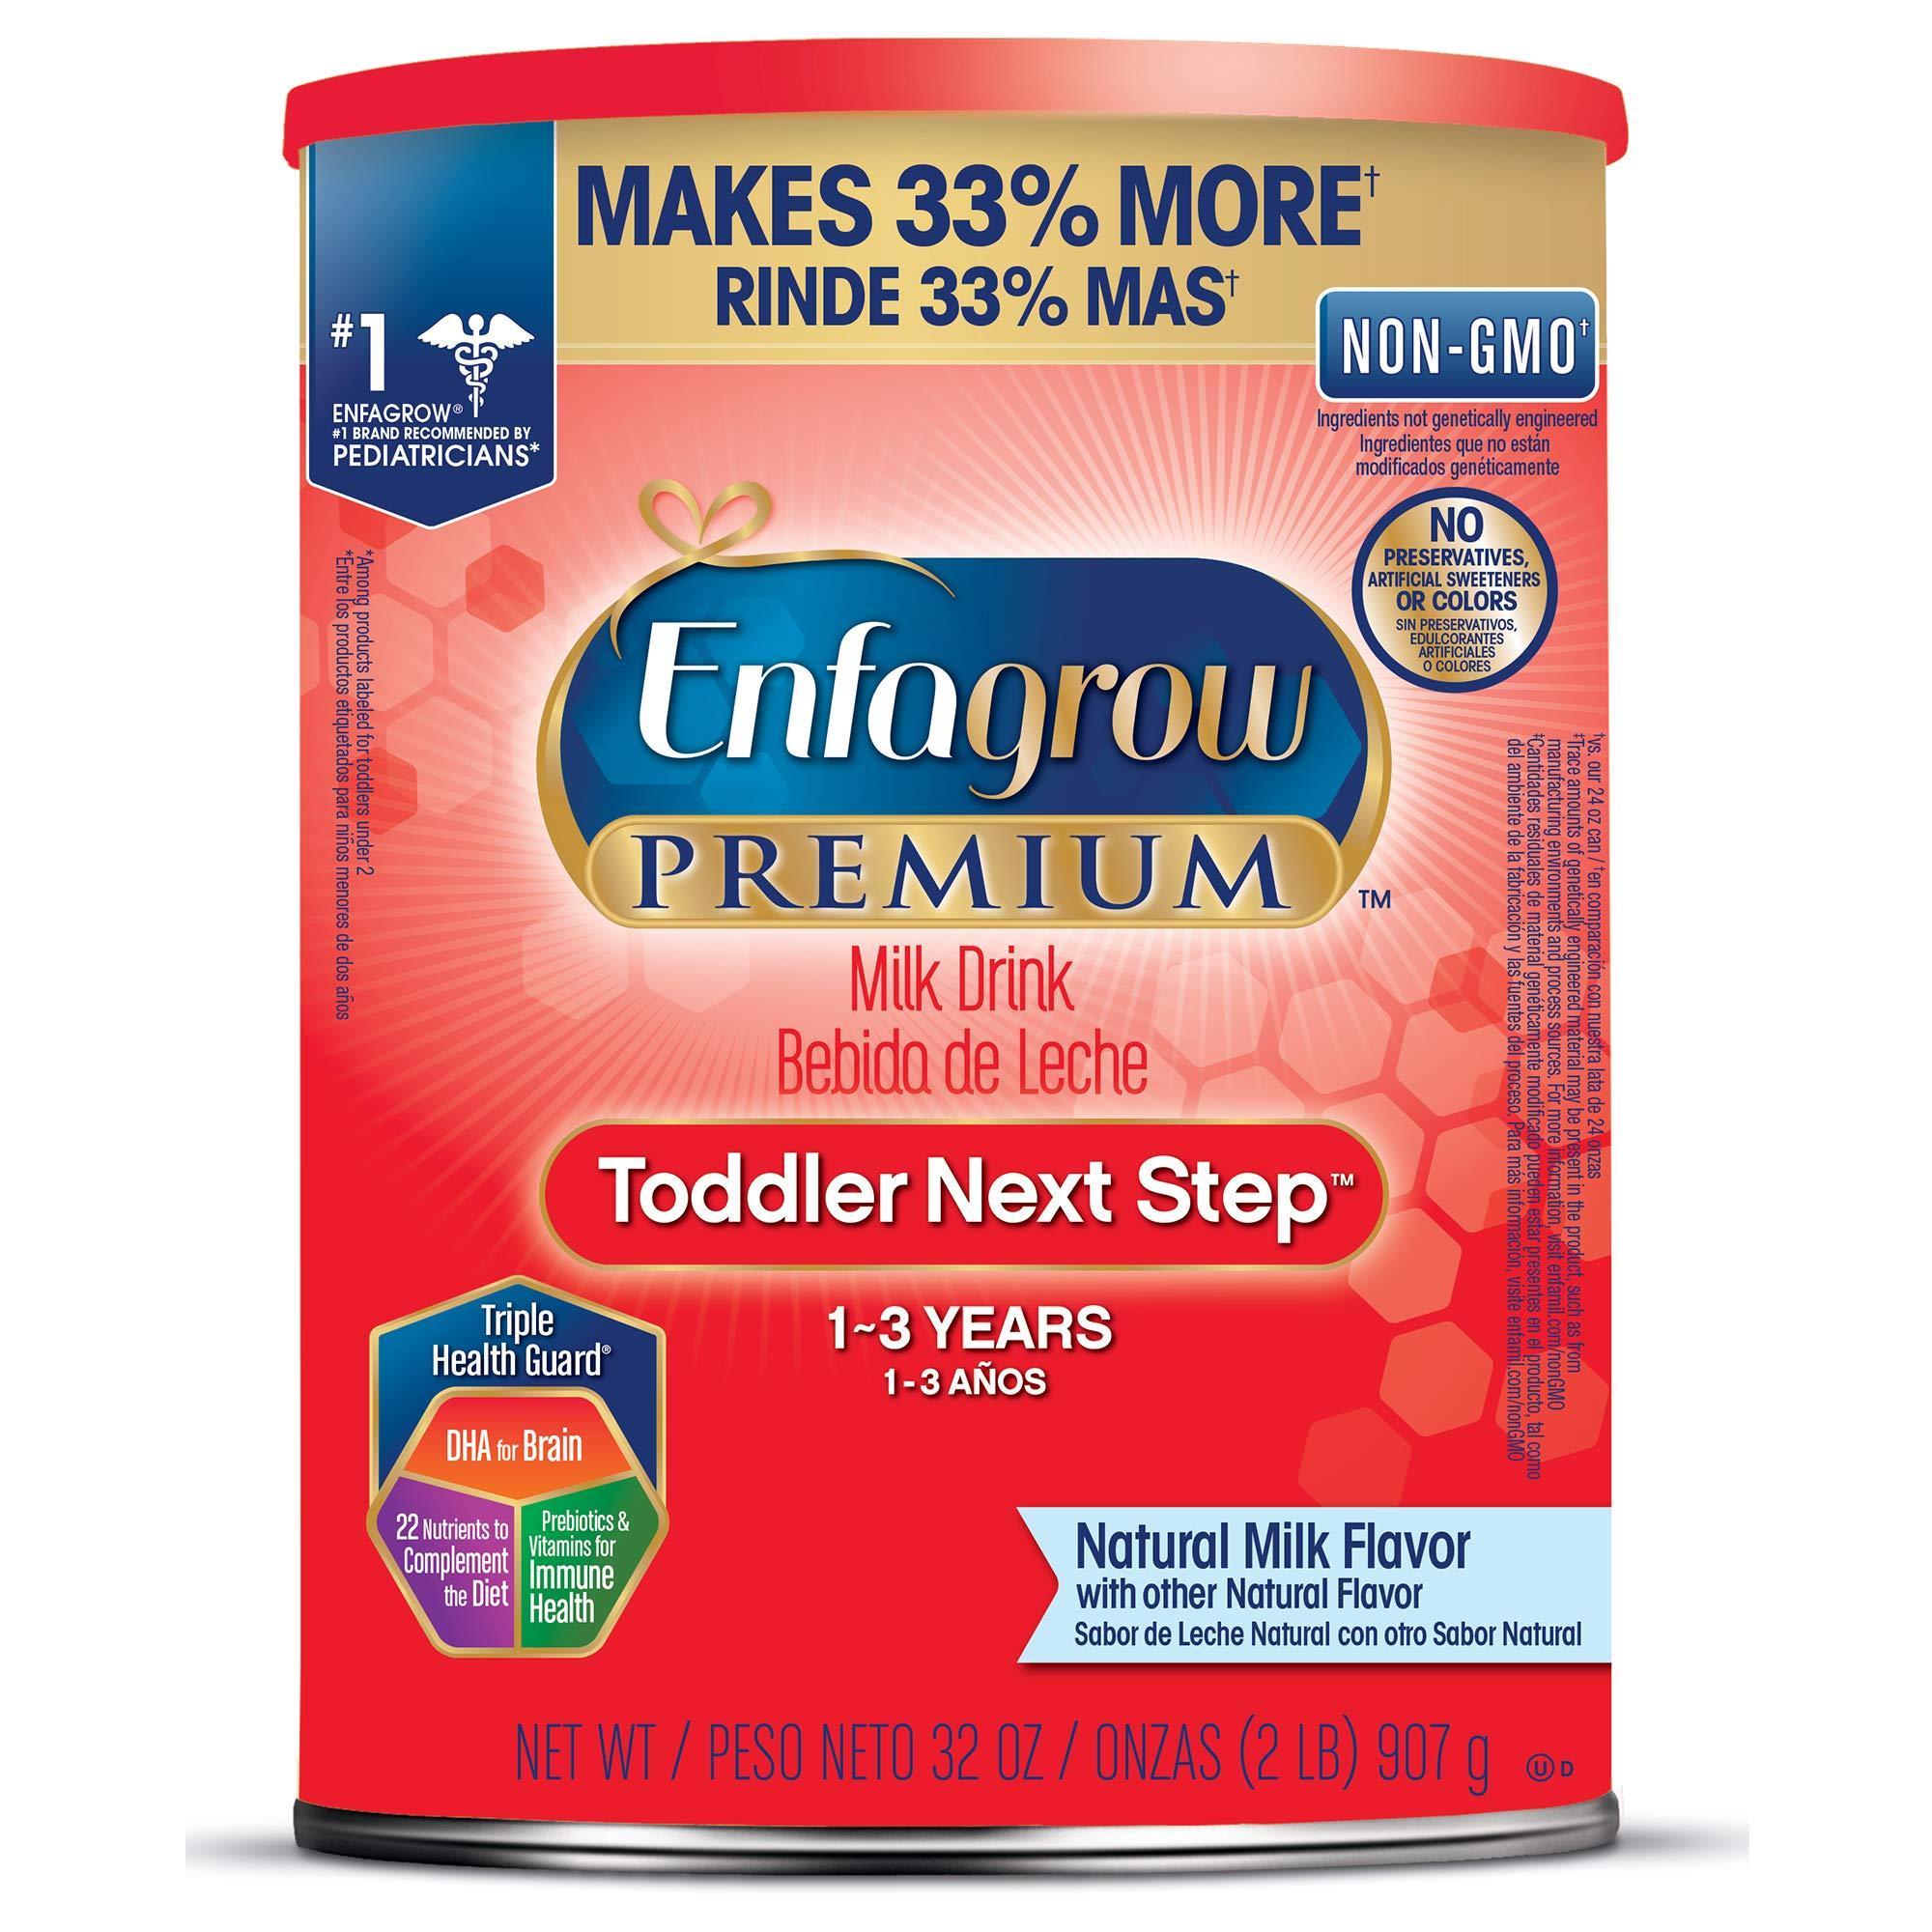 Enfagrow PREMIUM Toddler Next Step, Natural Milk Flavor - Powder Can, 32 oz